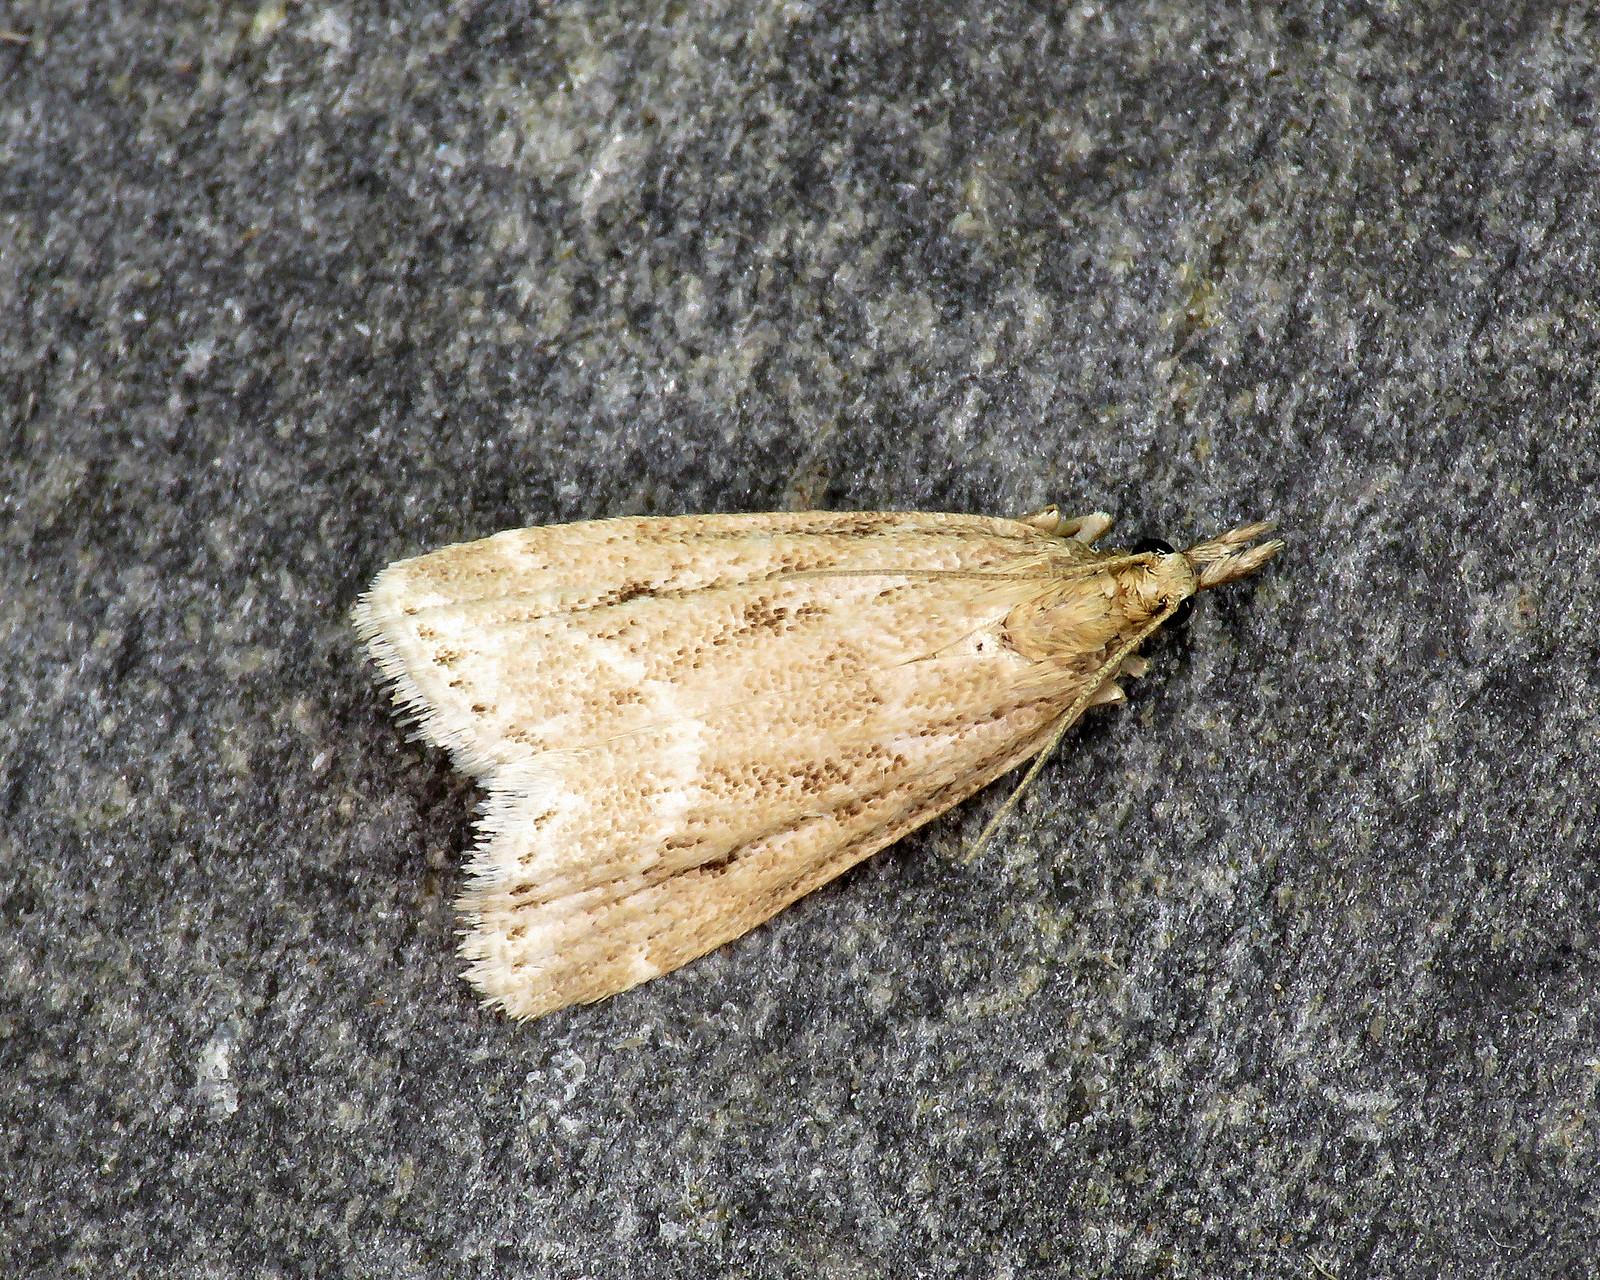 63.075 Eudonia pallida